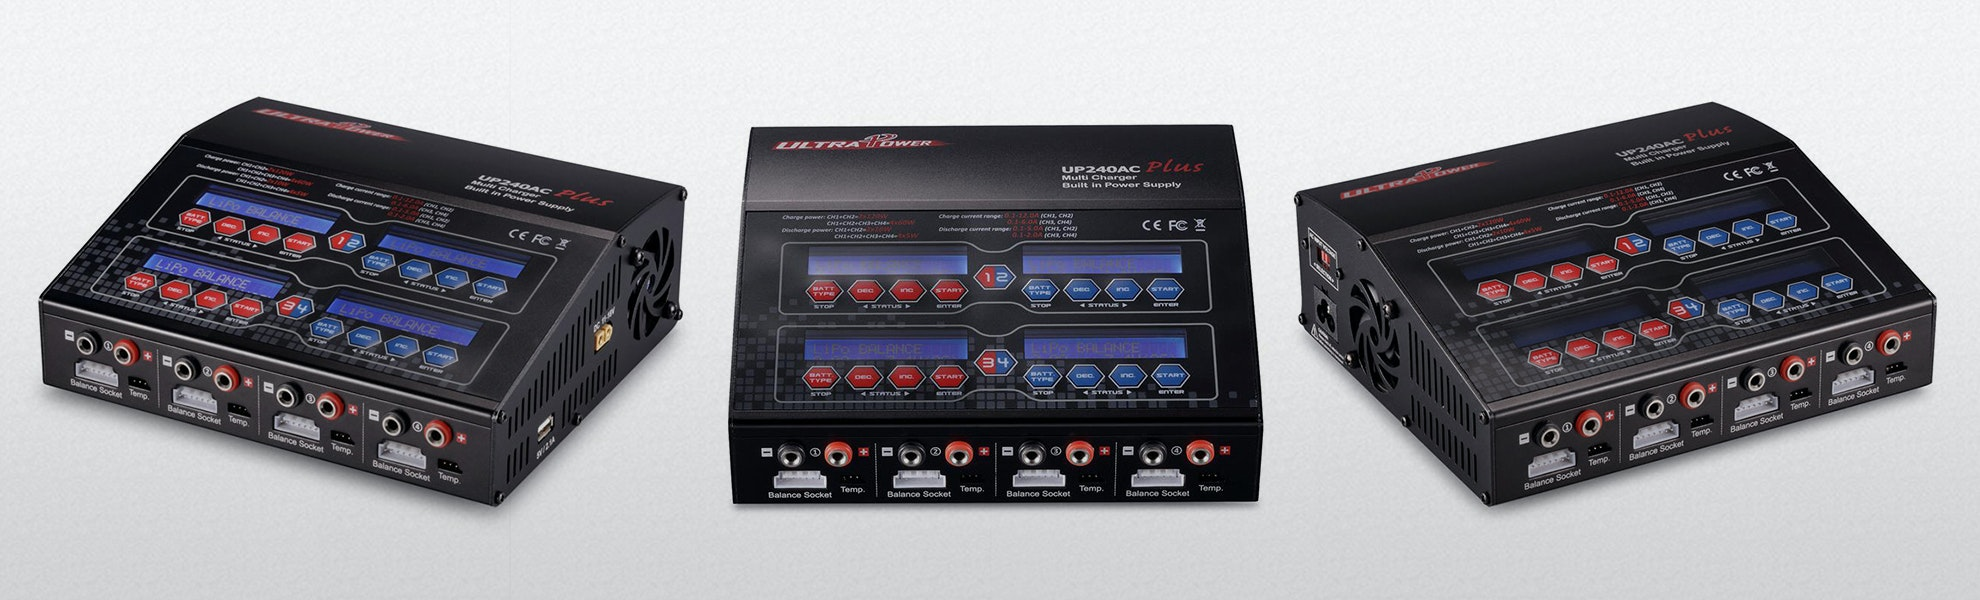 Ultra Power 240AC Plus Quad Port Multi-Charger